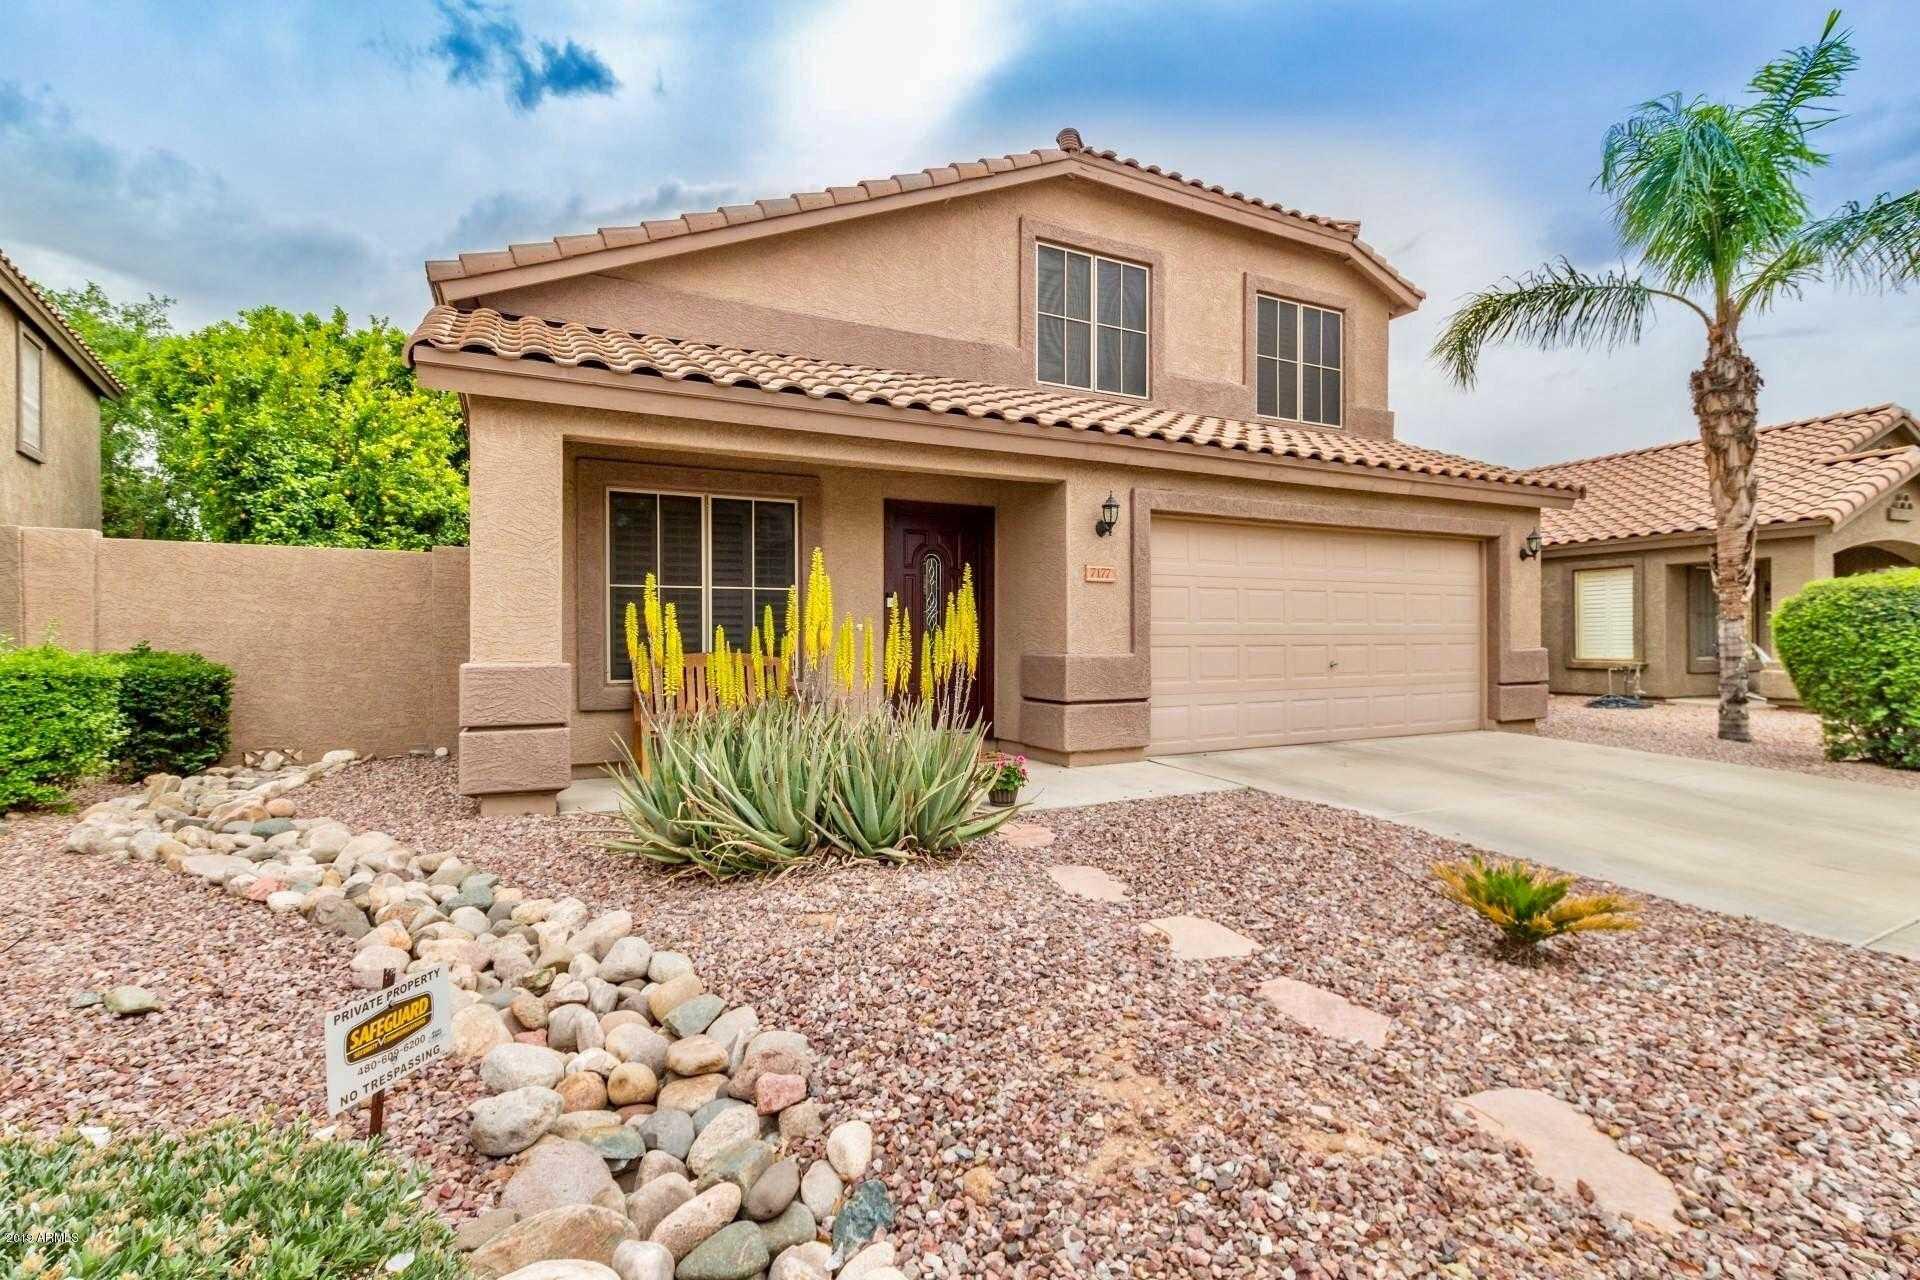 $369,000 - 4Br/3Ba - Home for Sale in Arrowhead Ranch, Glendale